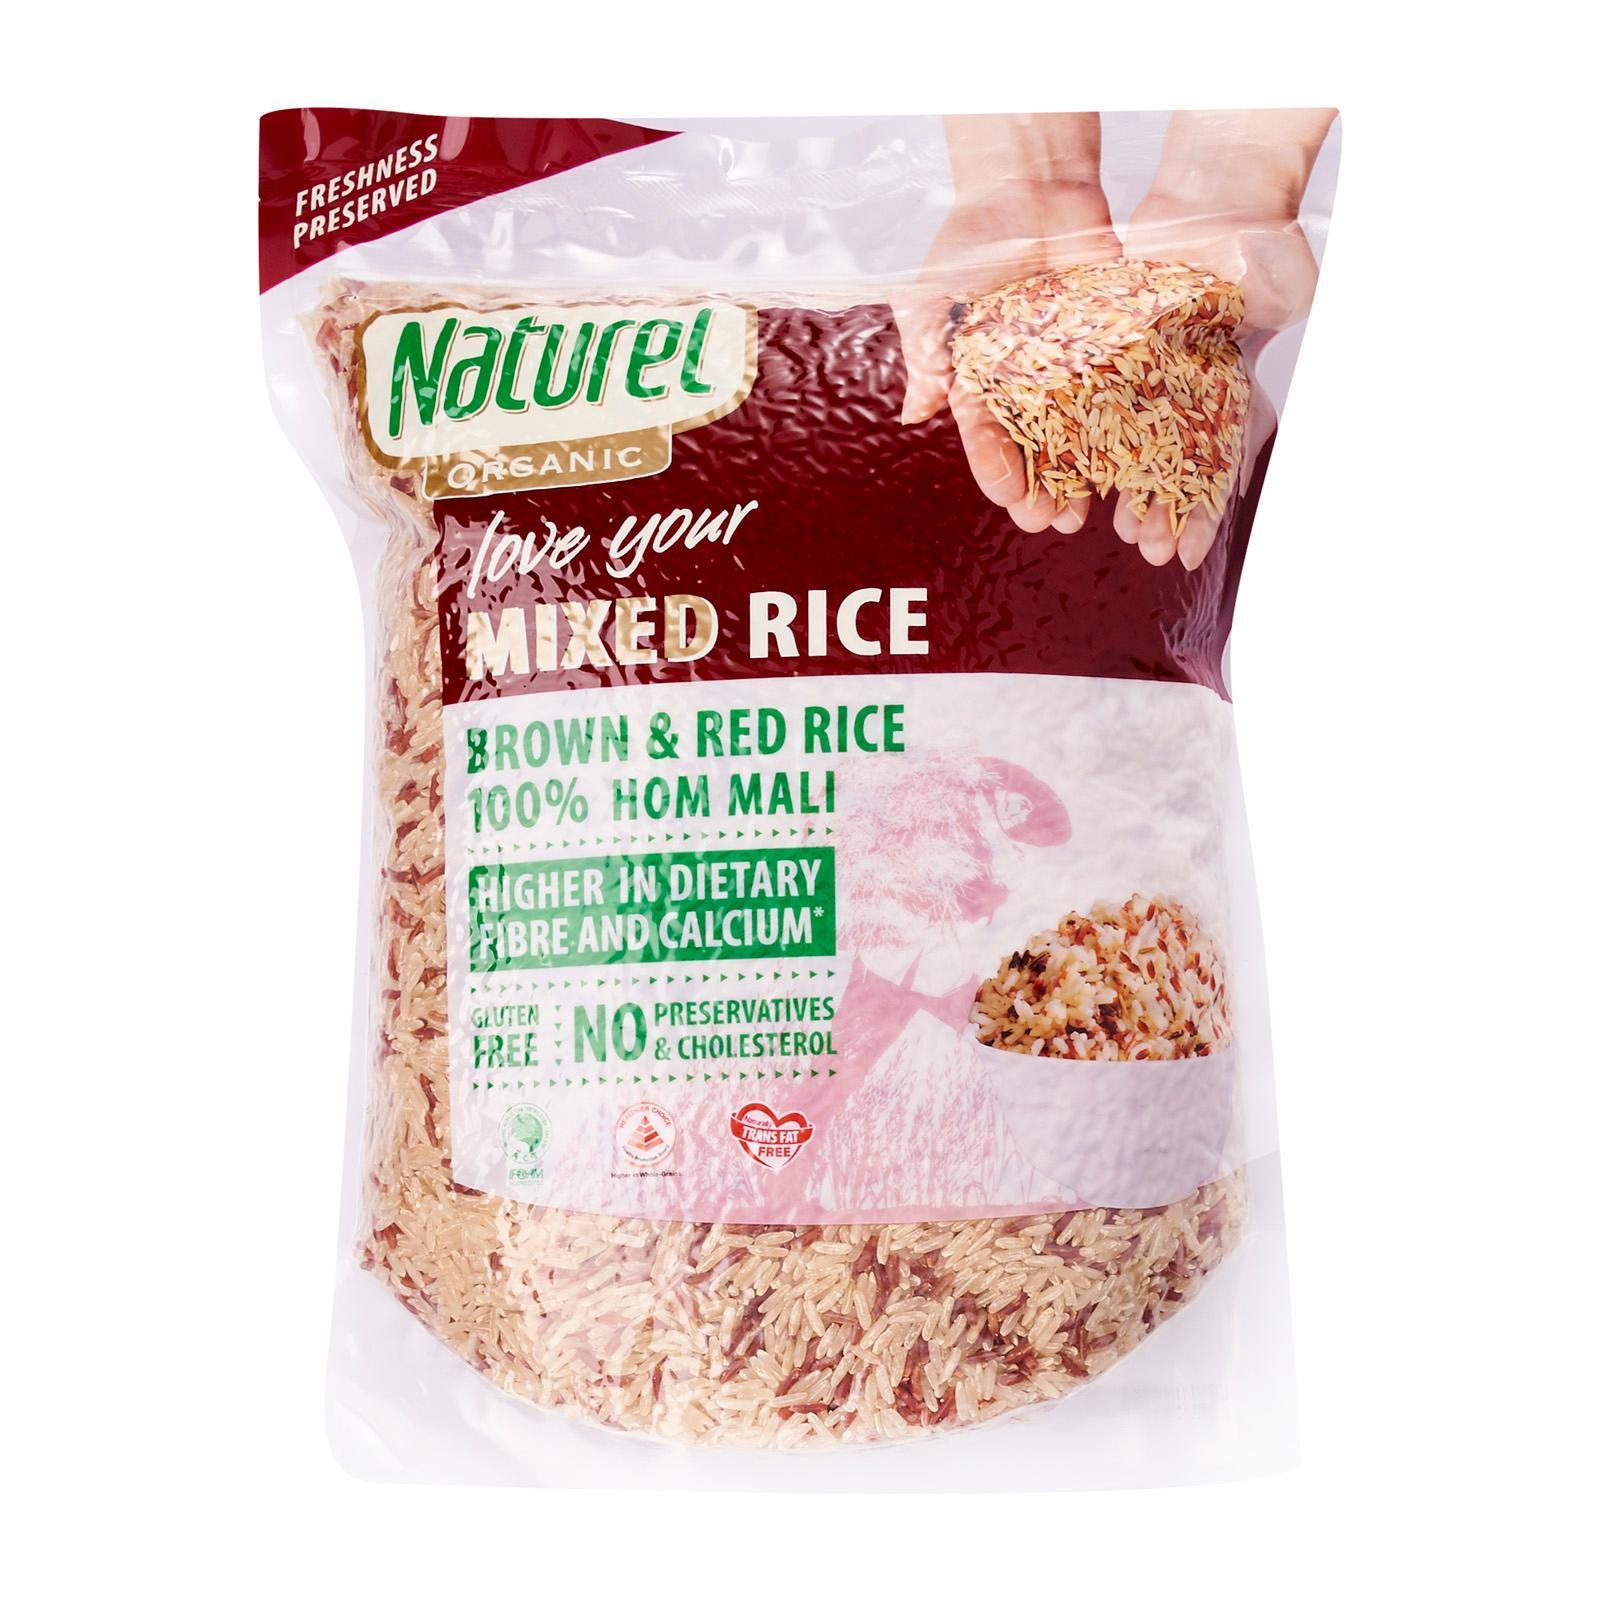 Naturel Organic Mixed Brown and Red Rice